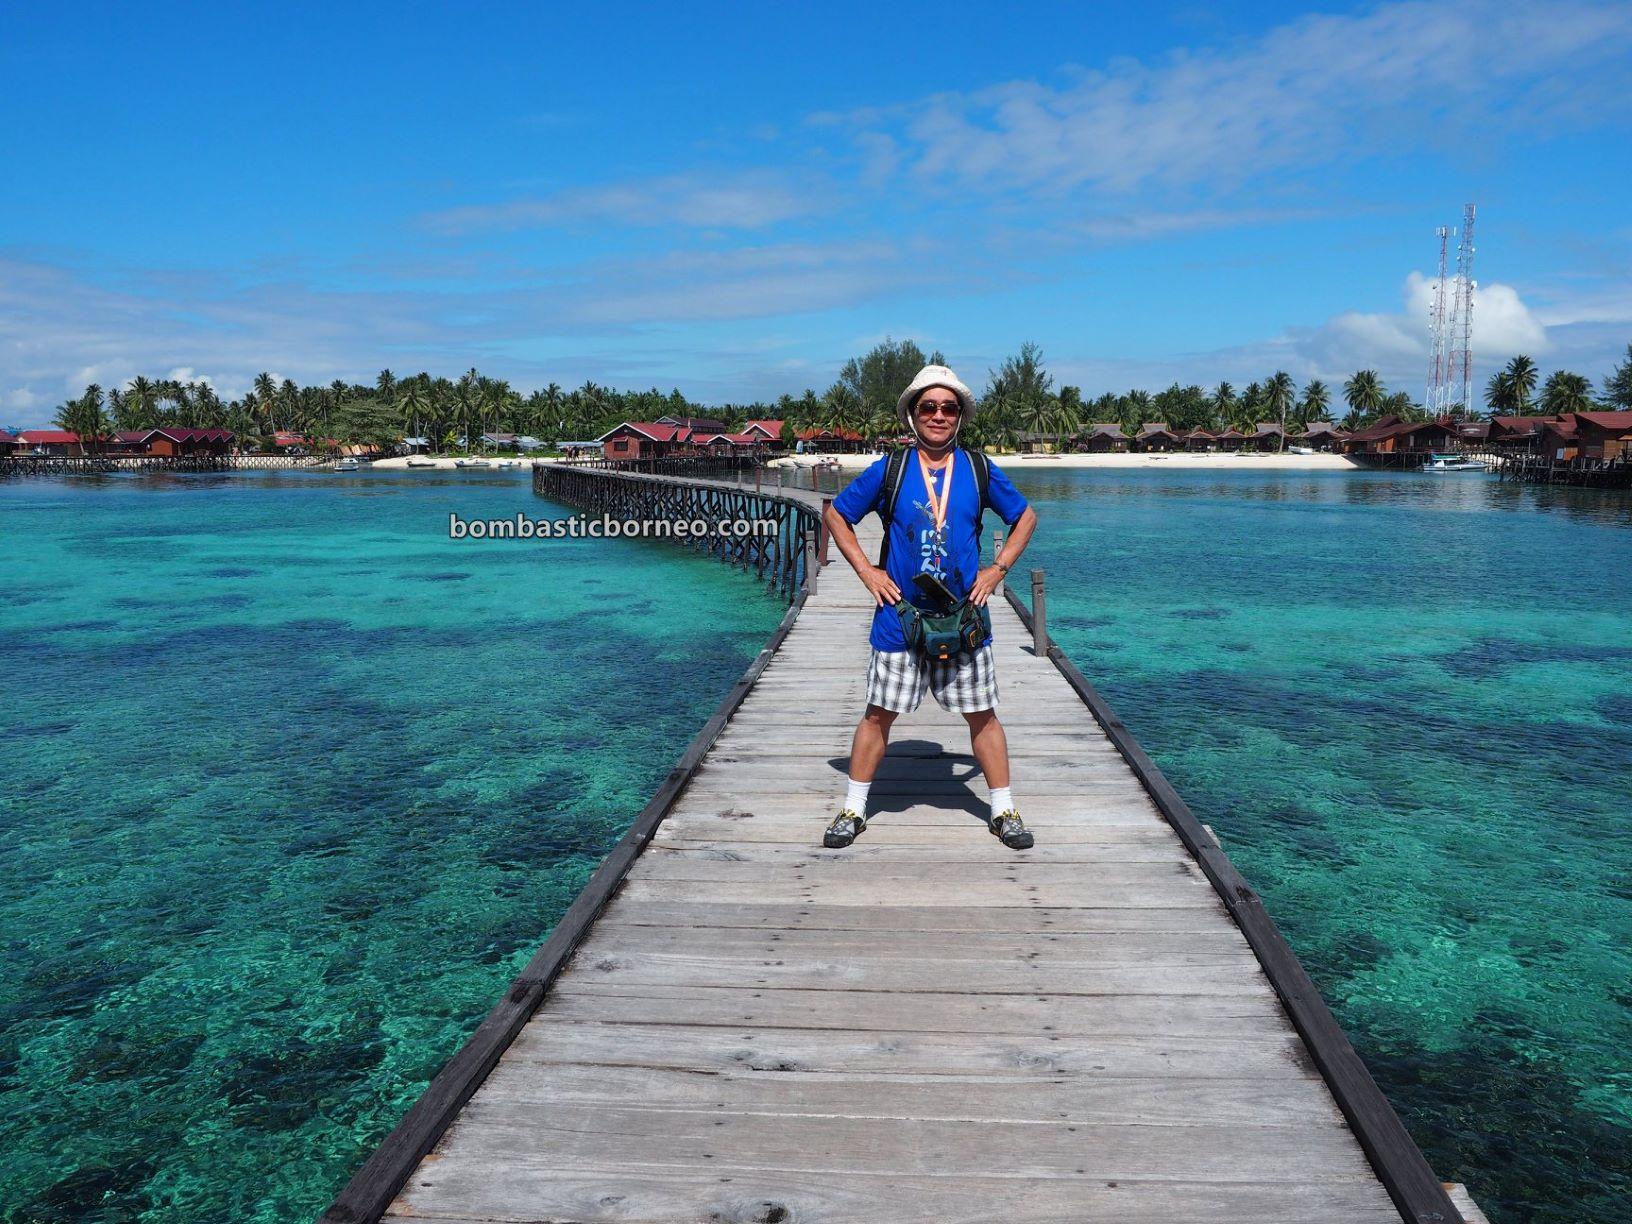 Derawan Archipelago, Pulau Derawan, backpackers, hidden paradise, diving spot, exploration, nature, vacation, Berau, East Kalimantan, Indonesia, Objek wisata, Tourism, travel guide, Borneo